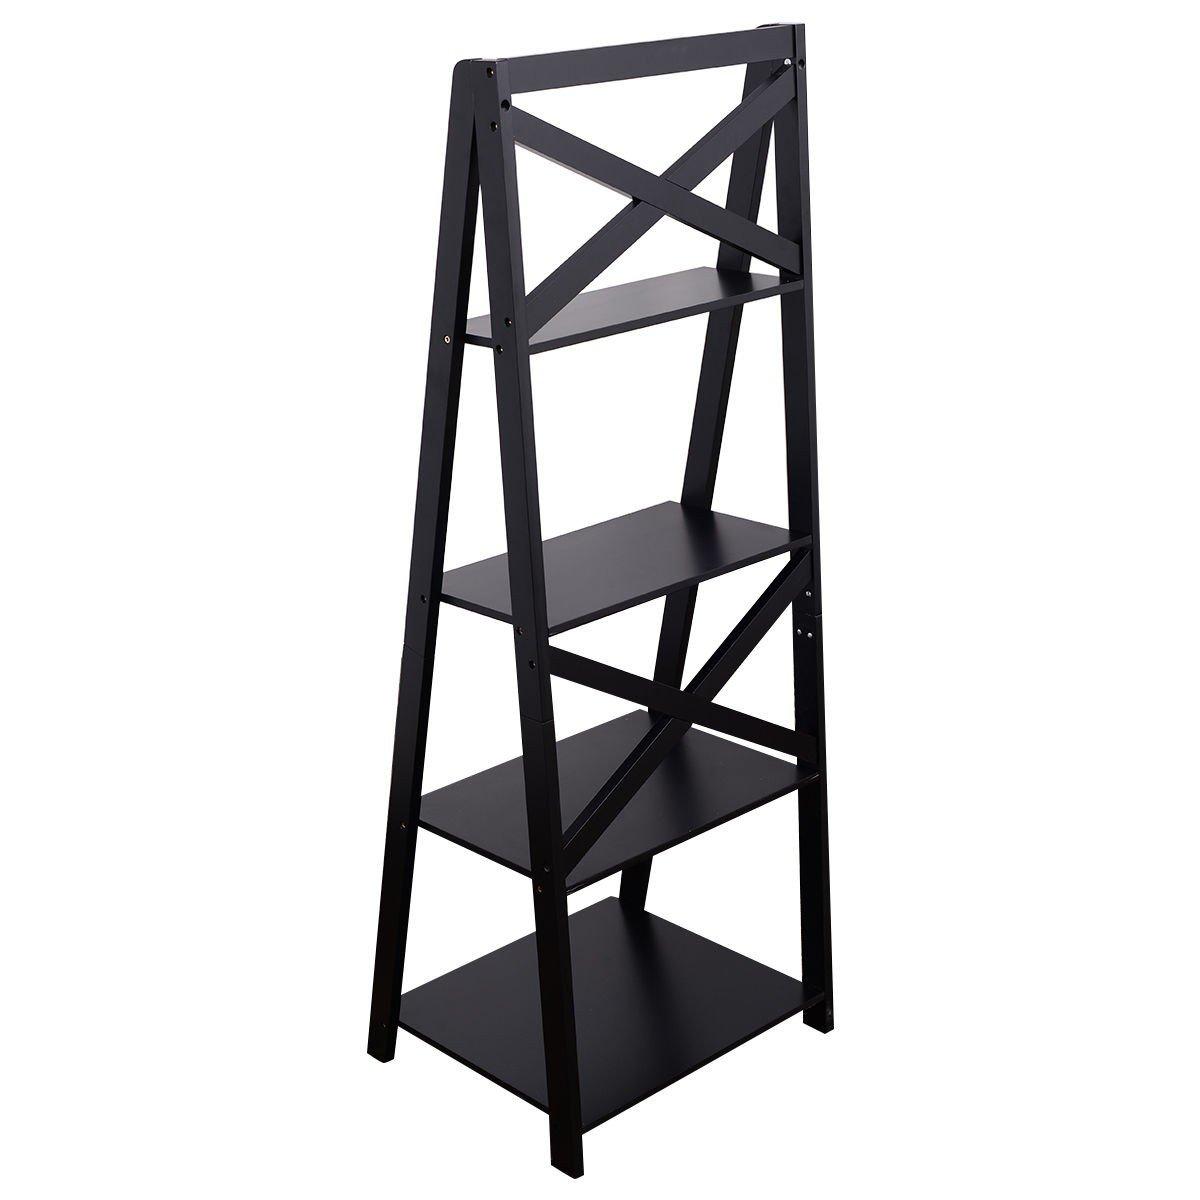 MyEasyShopping Black 4-Tier Ladder Space-saving Bookshelf Storage Bookshelf Bookcase Shelf Wood 4 5 Wooden Furniture Book Shelving Adjustable 3 Shelves Tier Display Organizer Home Cabinet